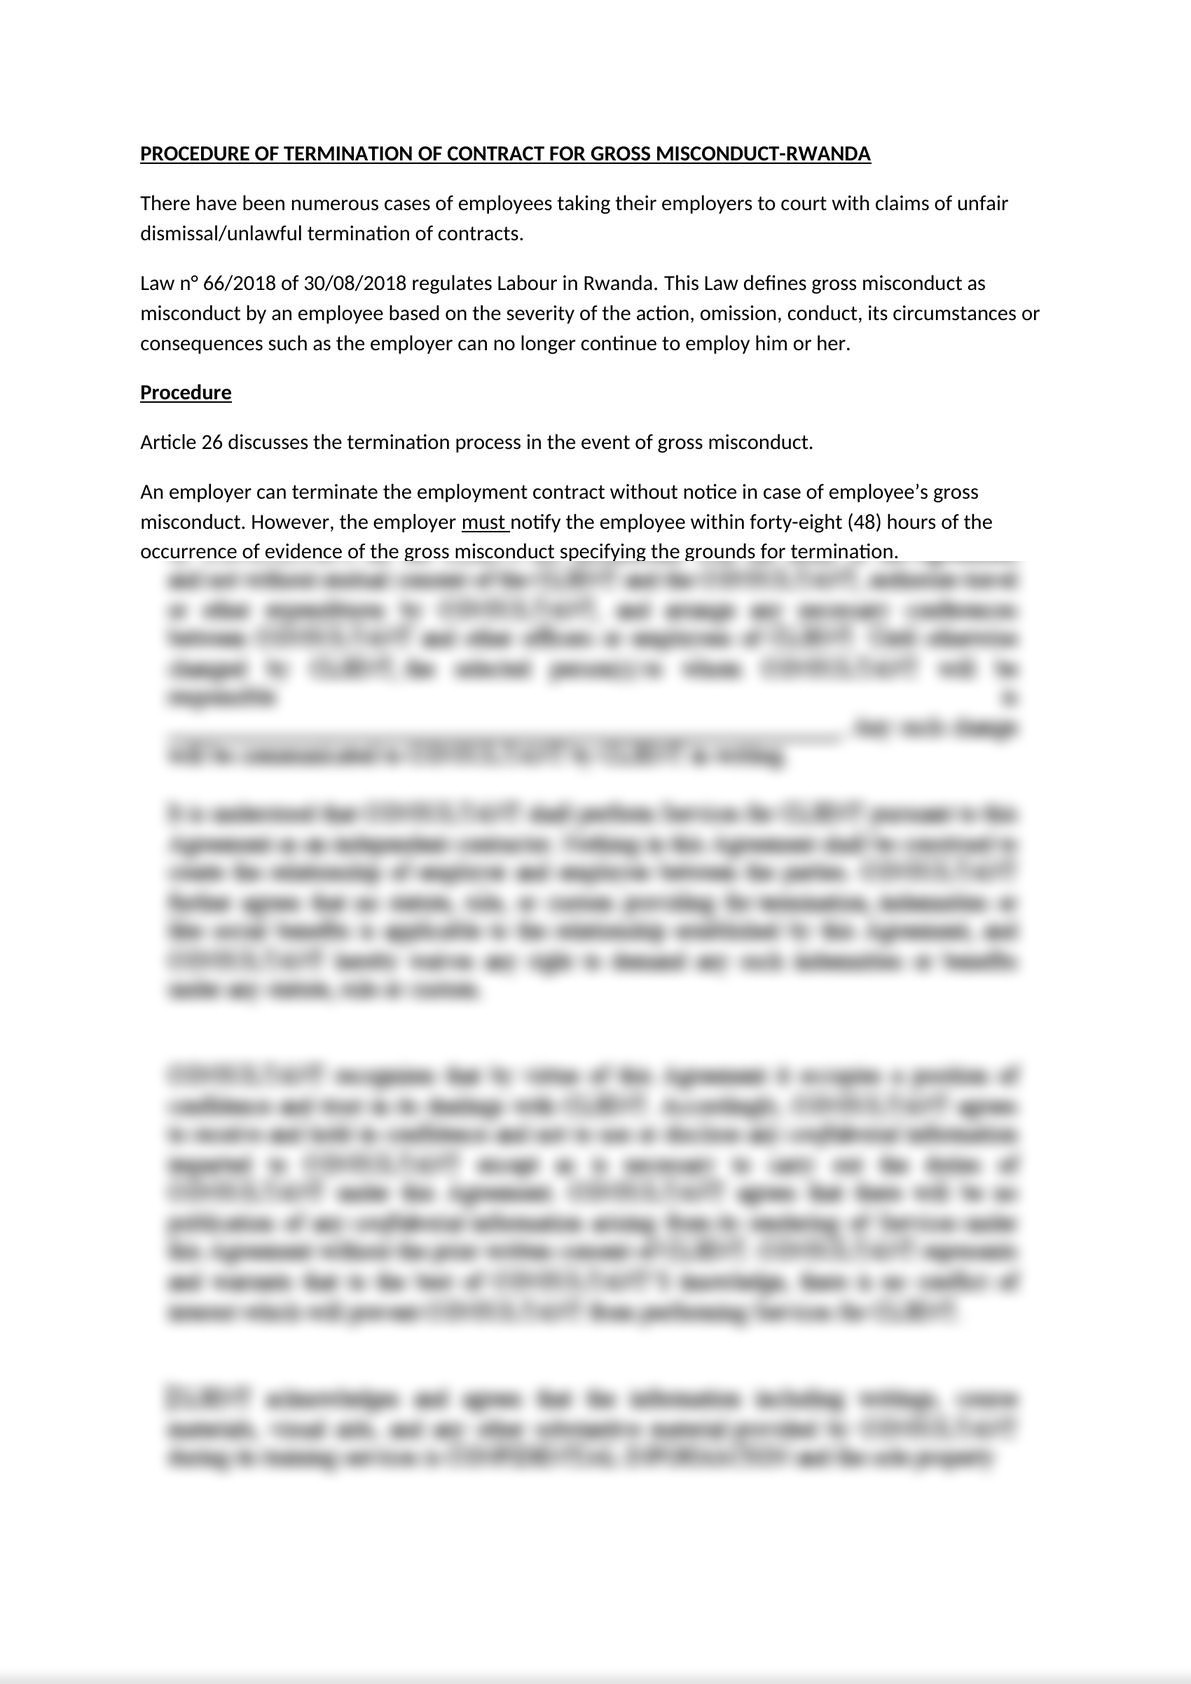 Termination procedure for gross misconduct under Rwanda Labour Law-0